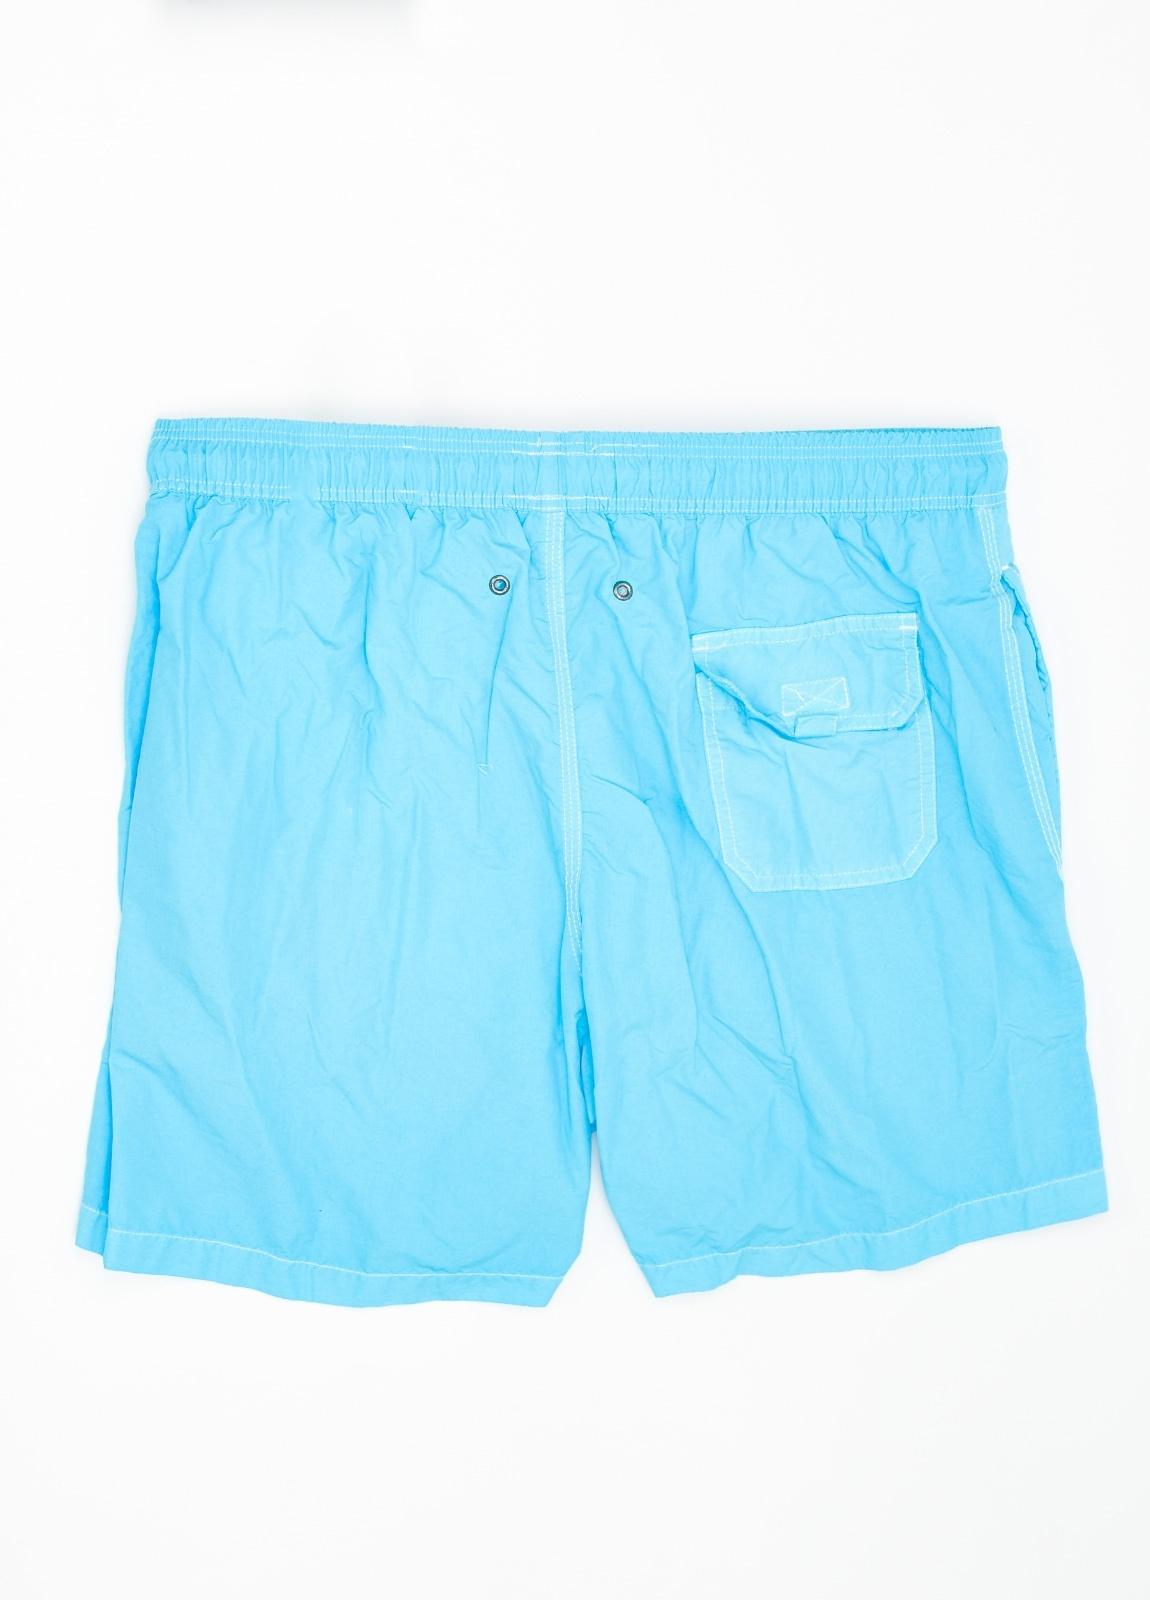 Bañador liso color azul turquesa. - Ítem1